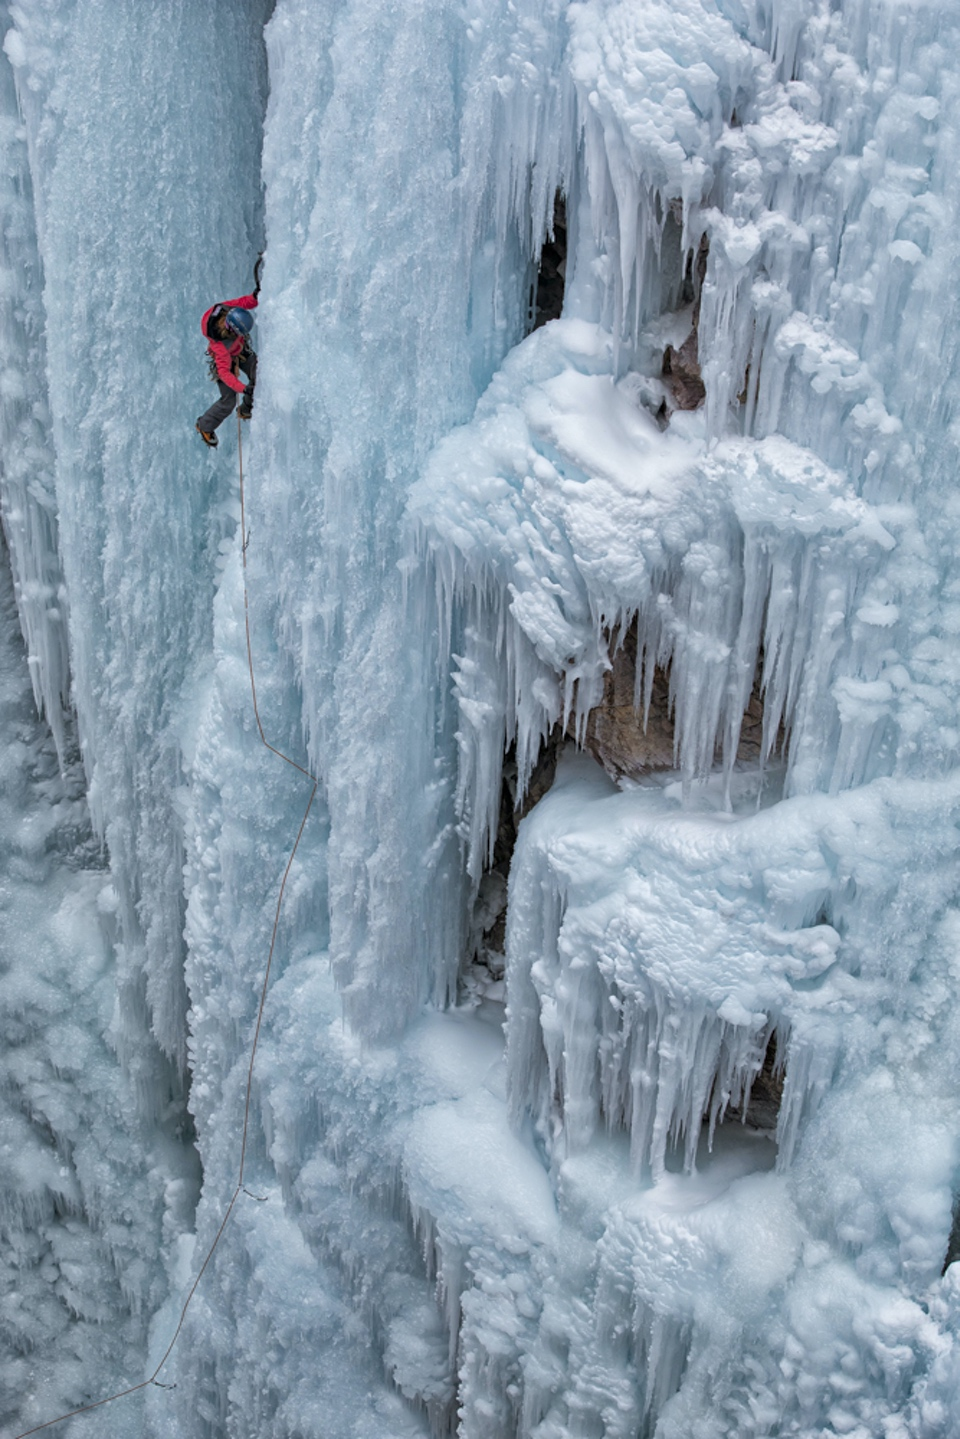 Kitty Calhoun ice climbing in Ouray Women's Clinics